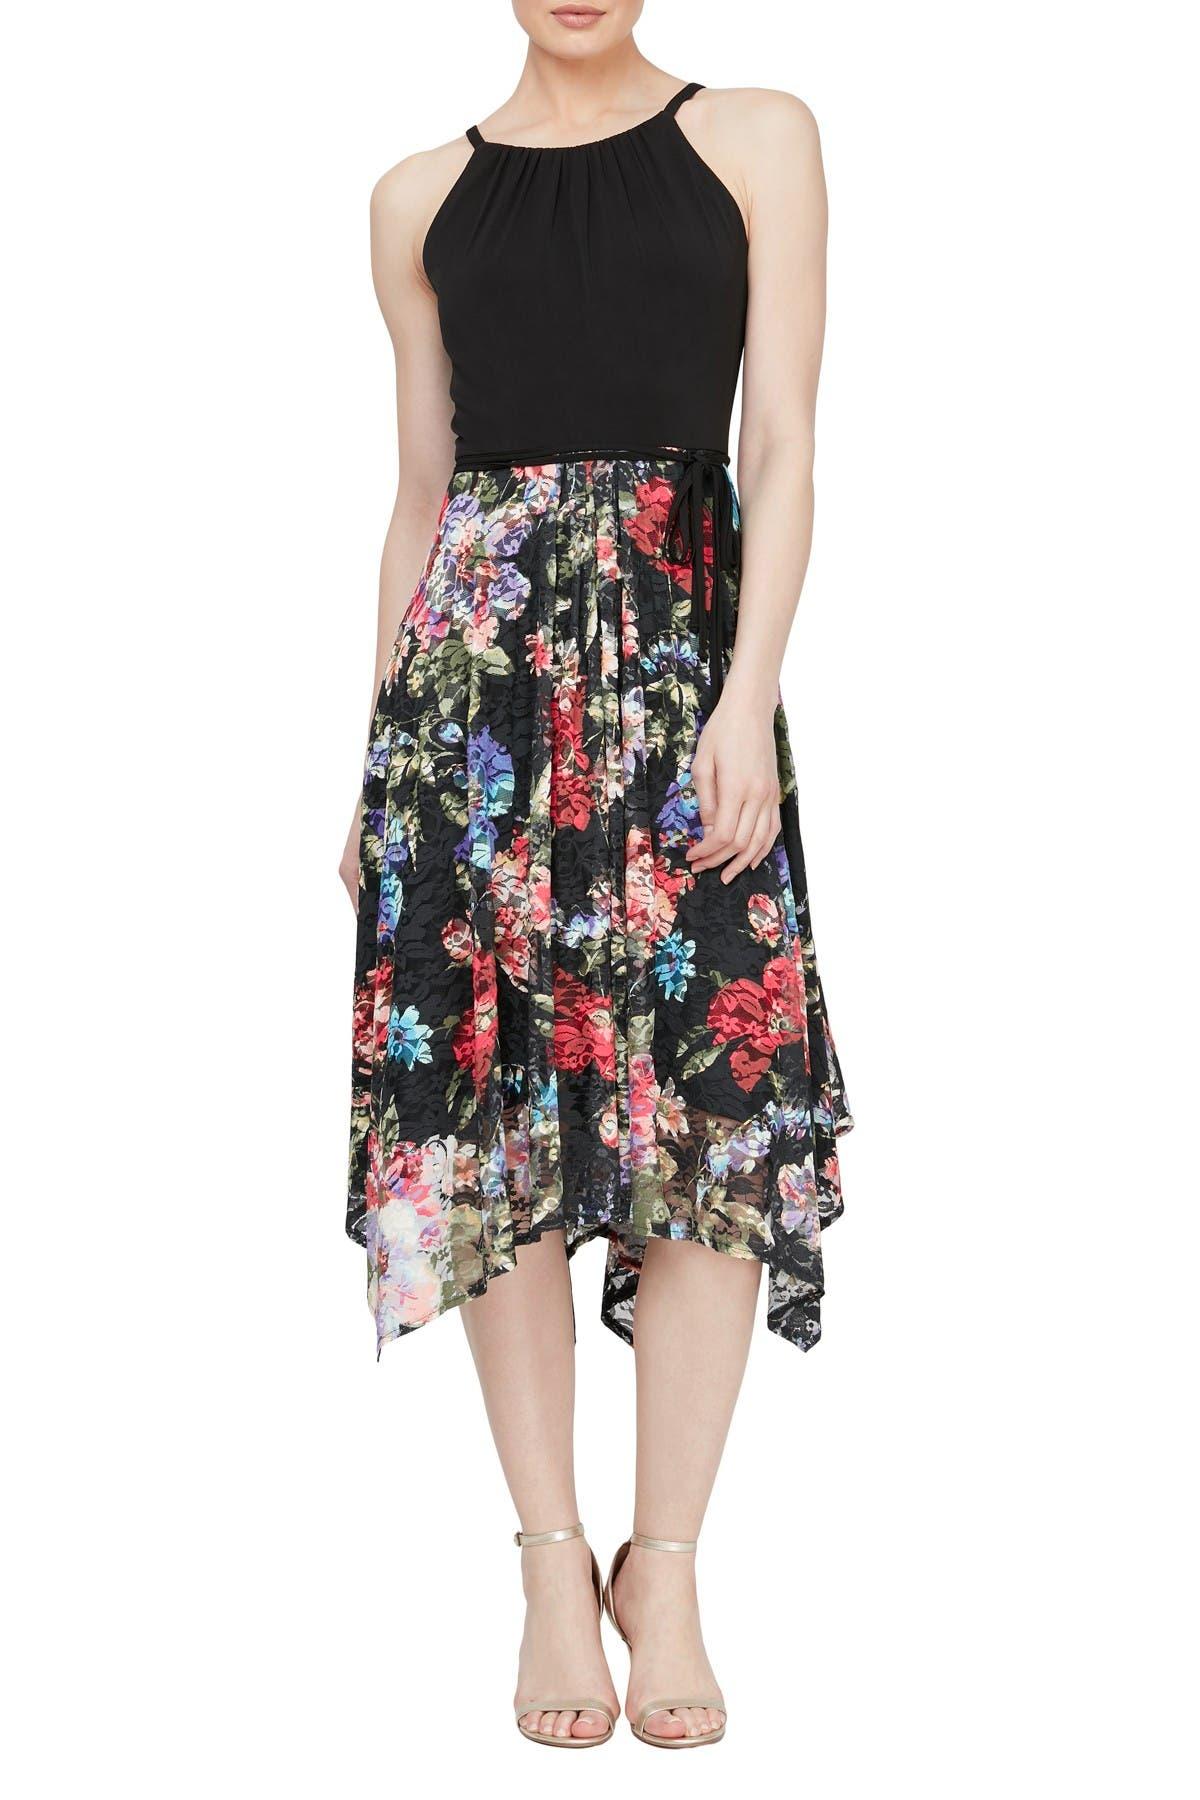 Image of SLNY Floral Handkerchief Hem Dress